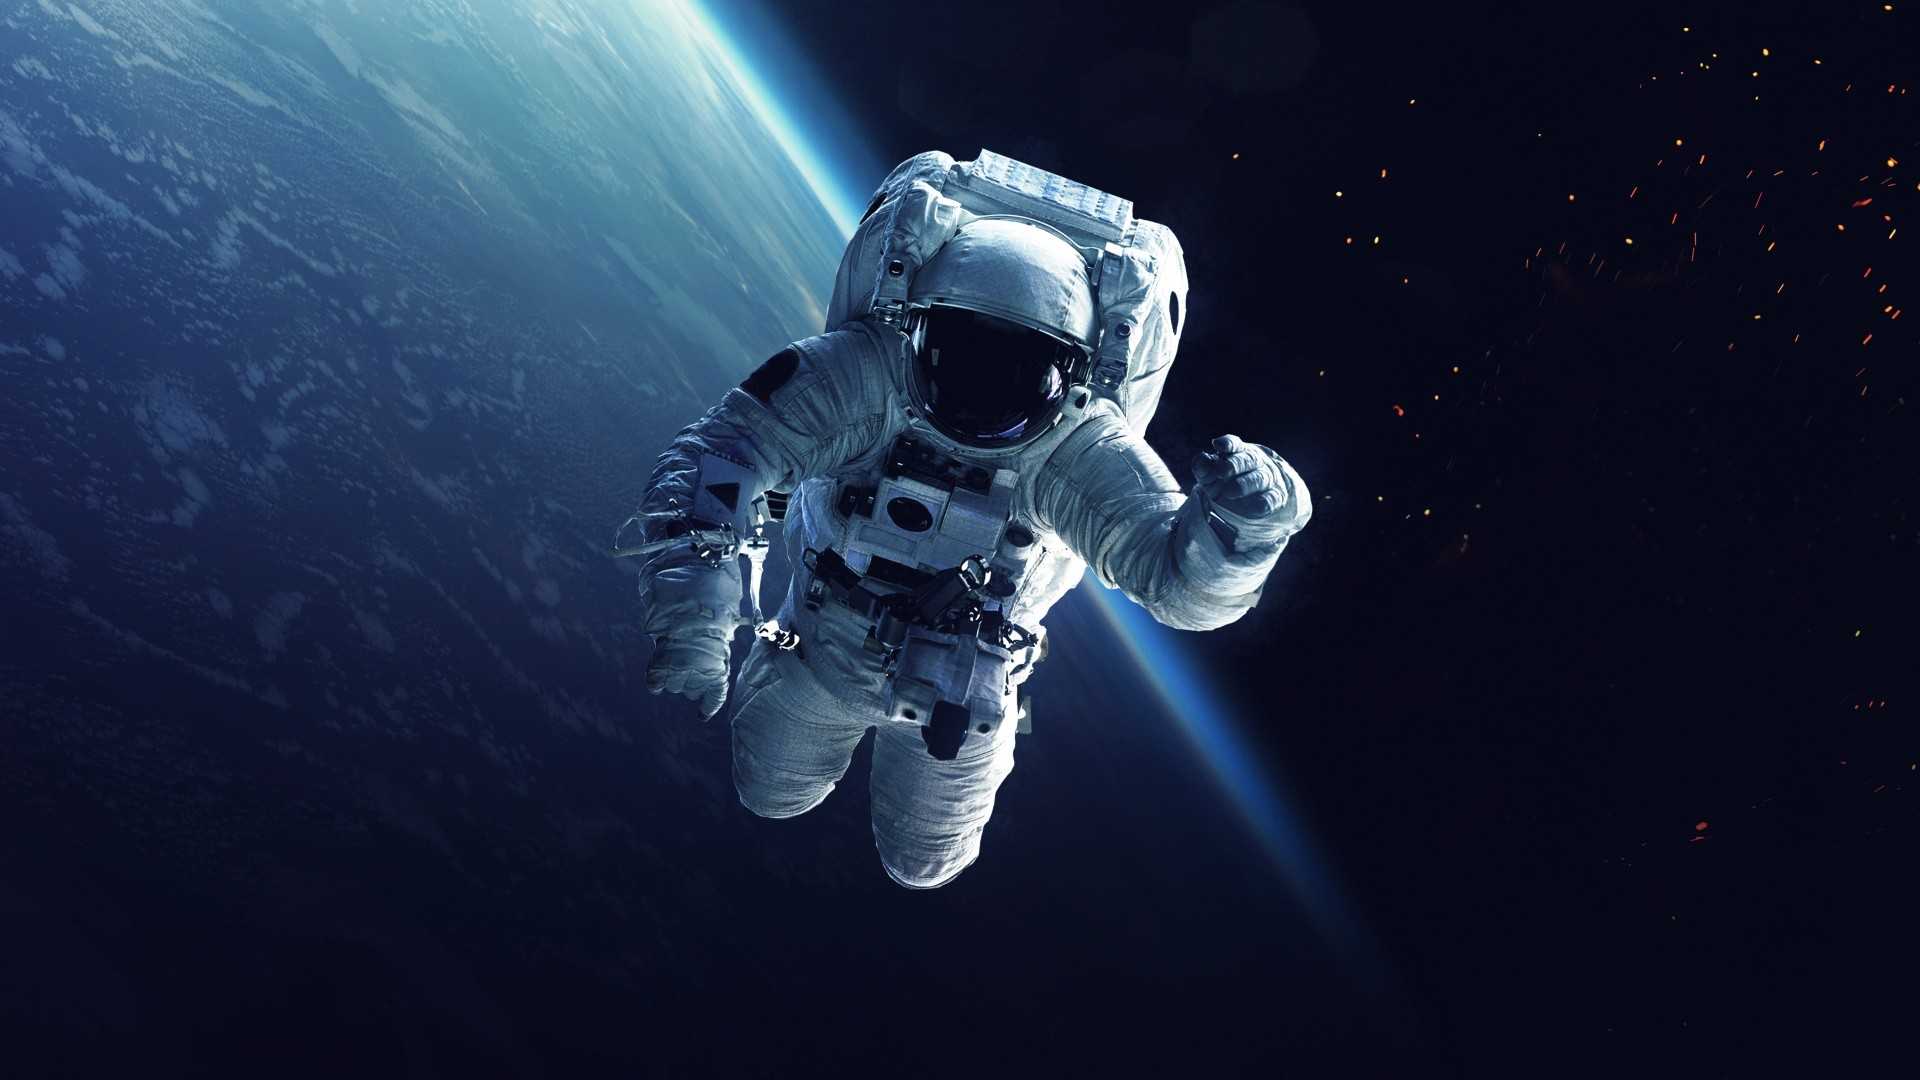 Astronaut Wallpaper theme